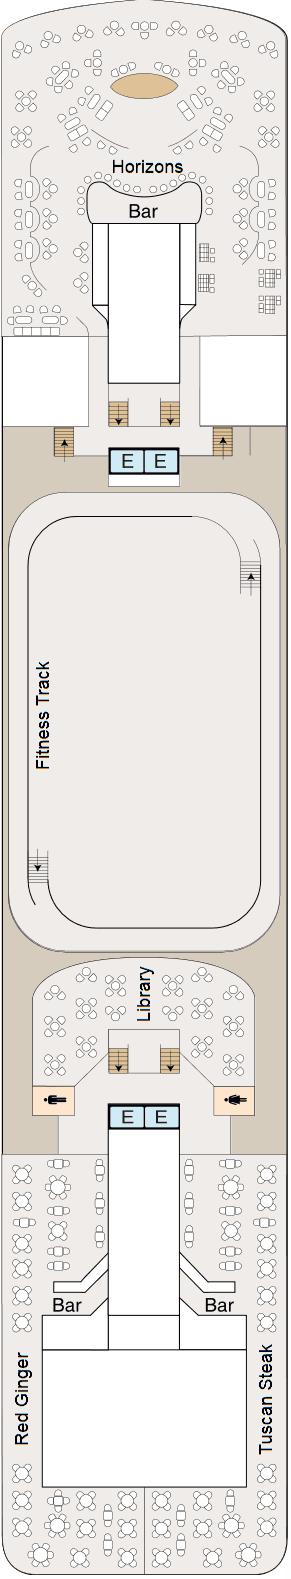 MS Sirena - Deck 10